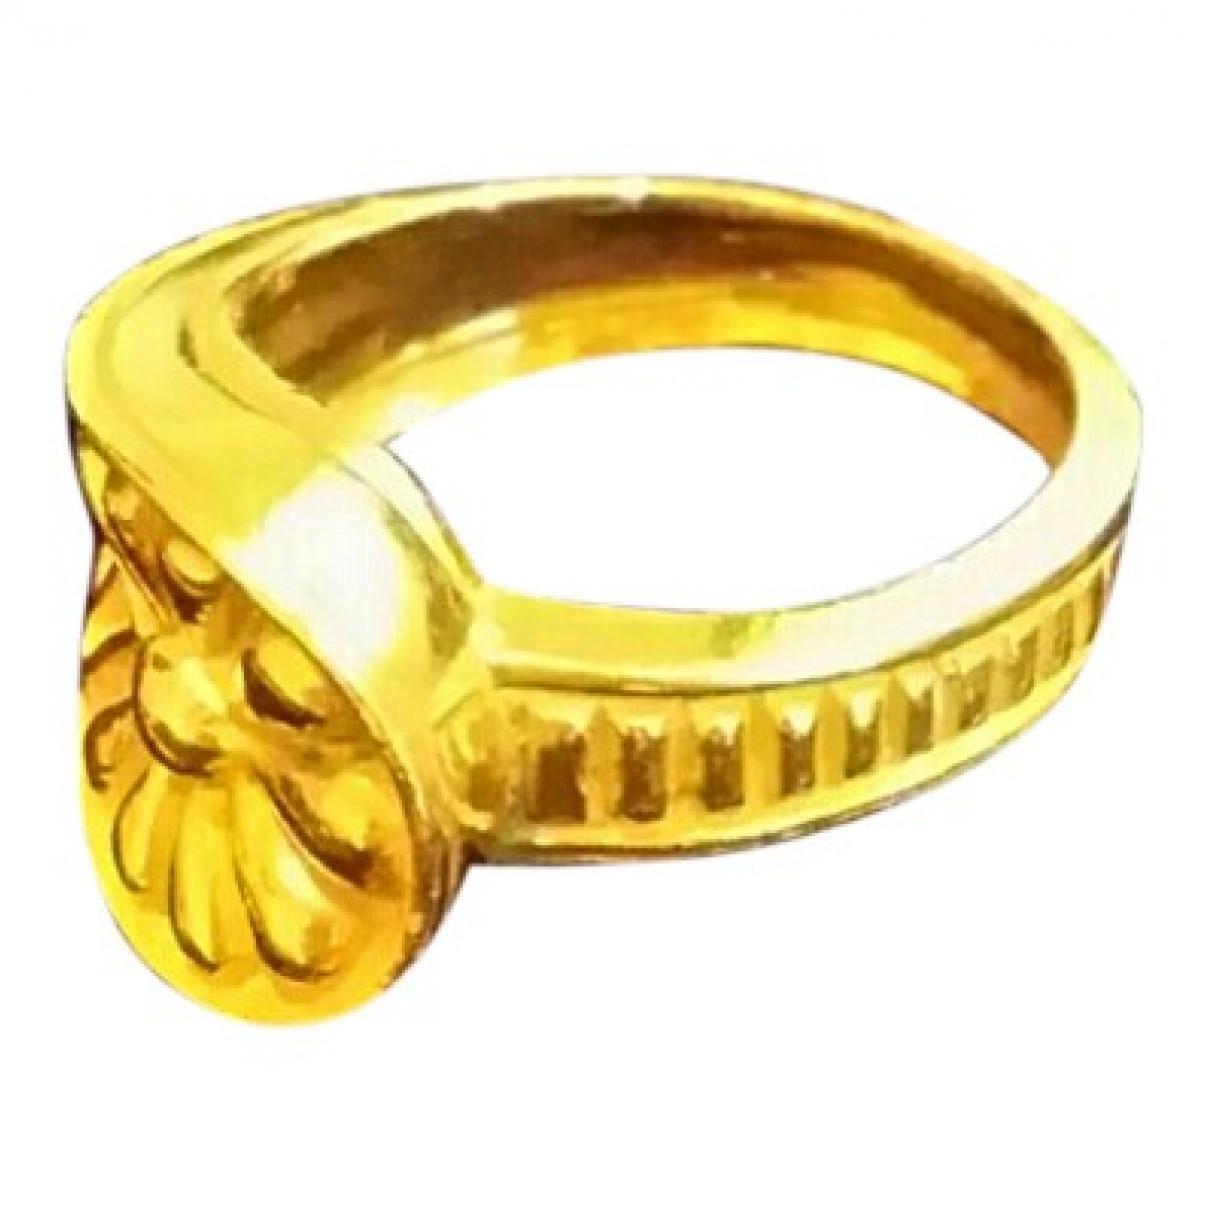 Zolotas \N Ring in  Gelb Gelbgold